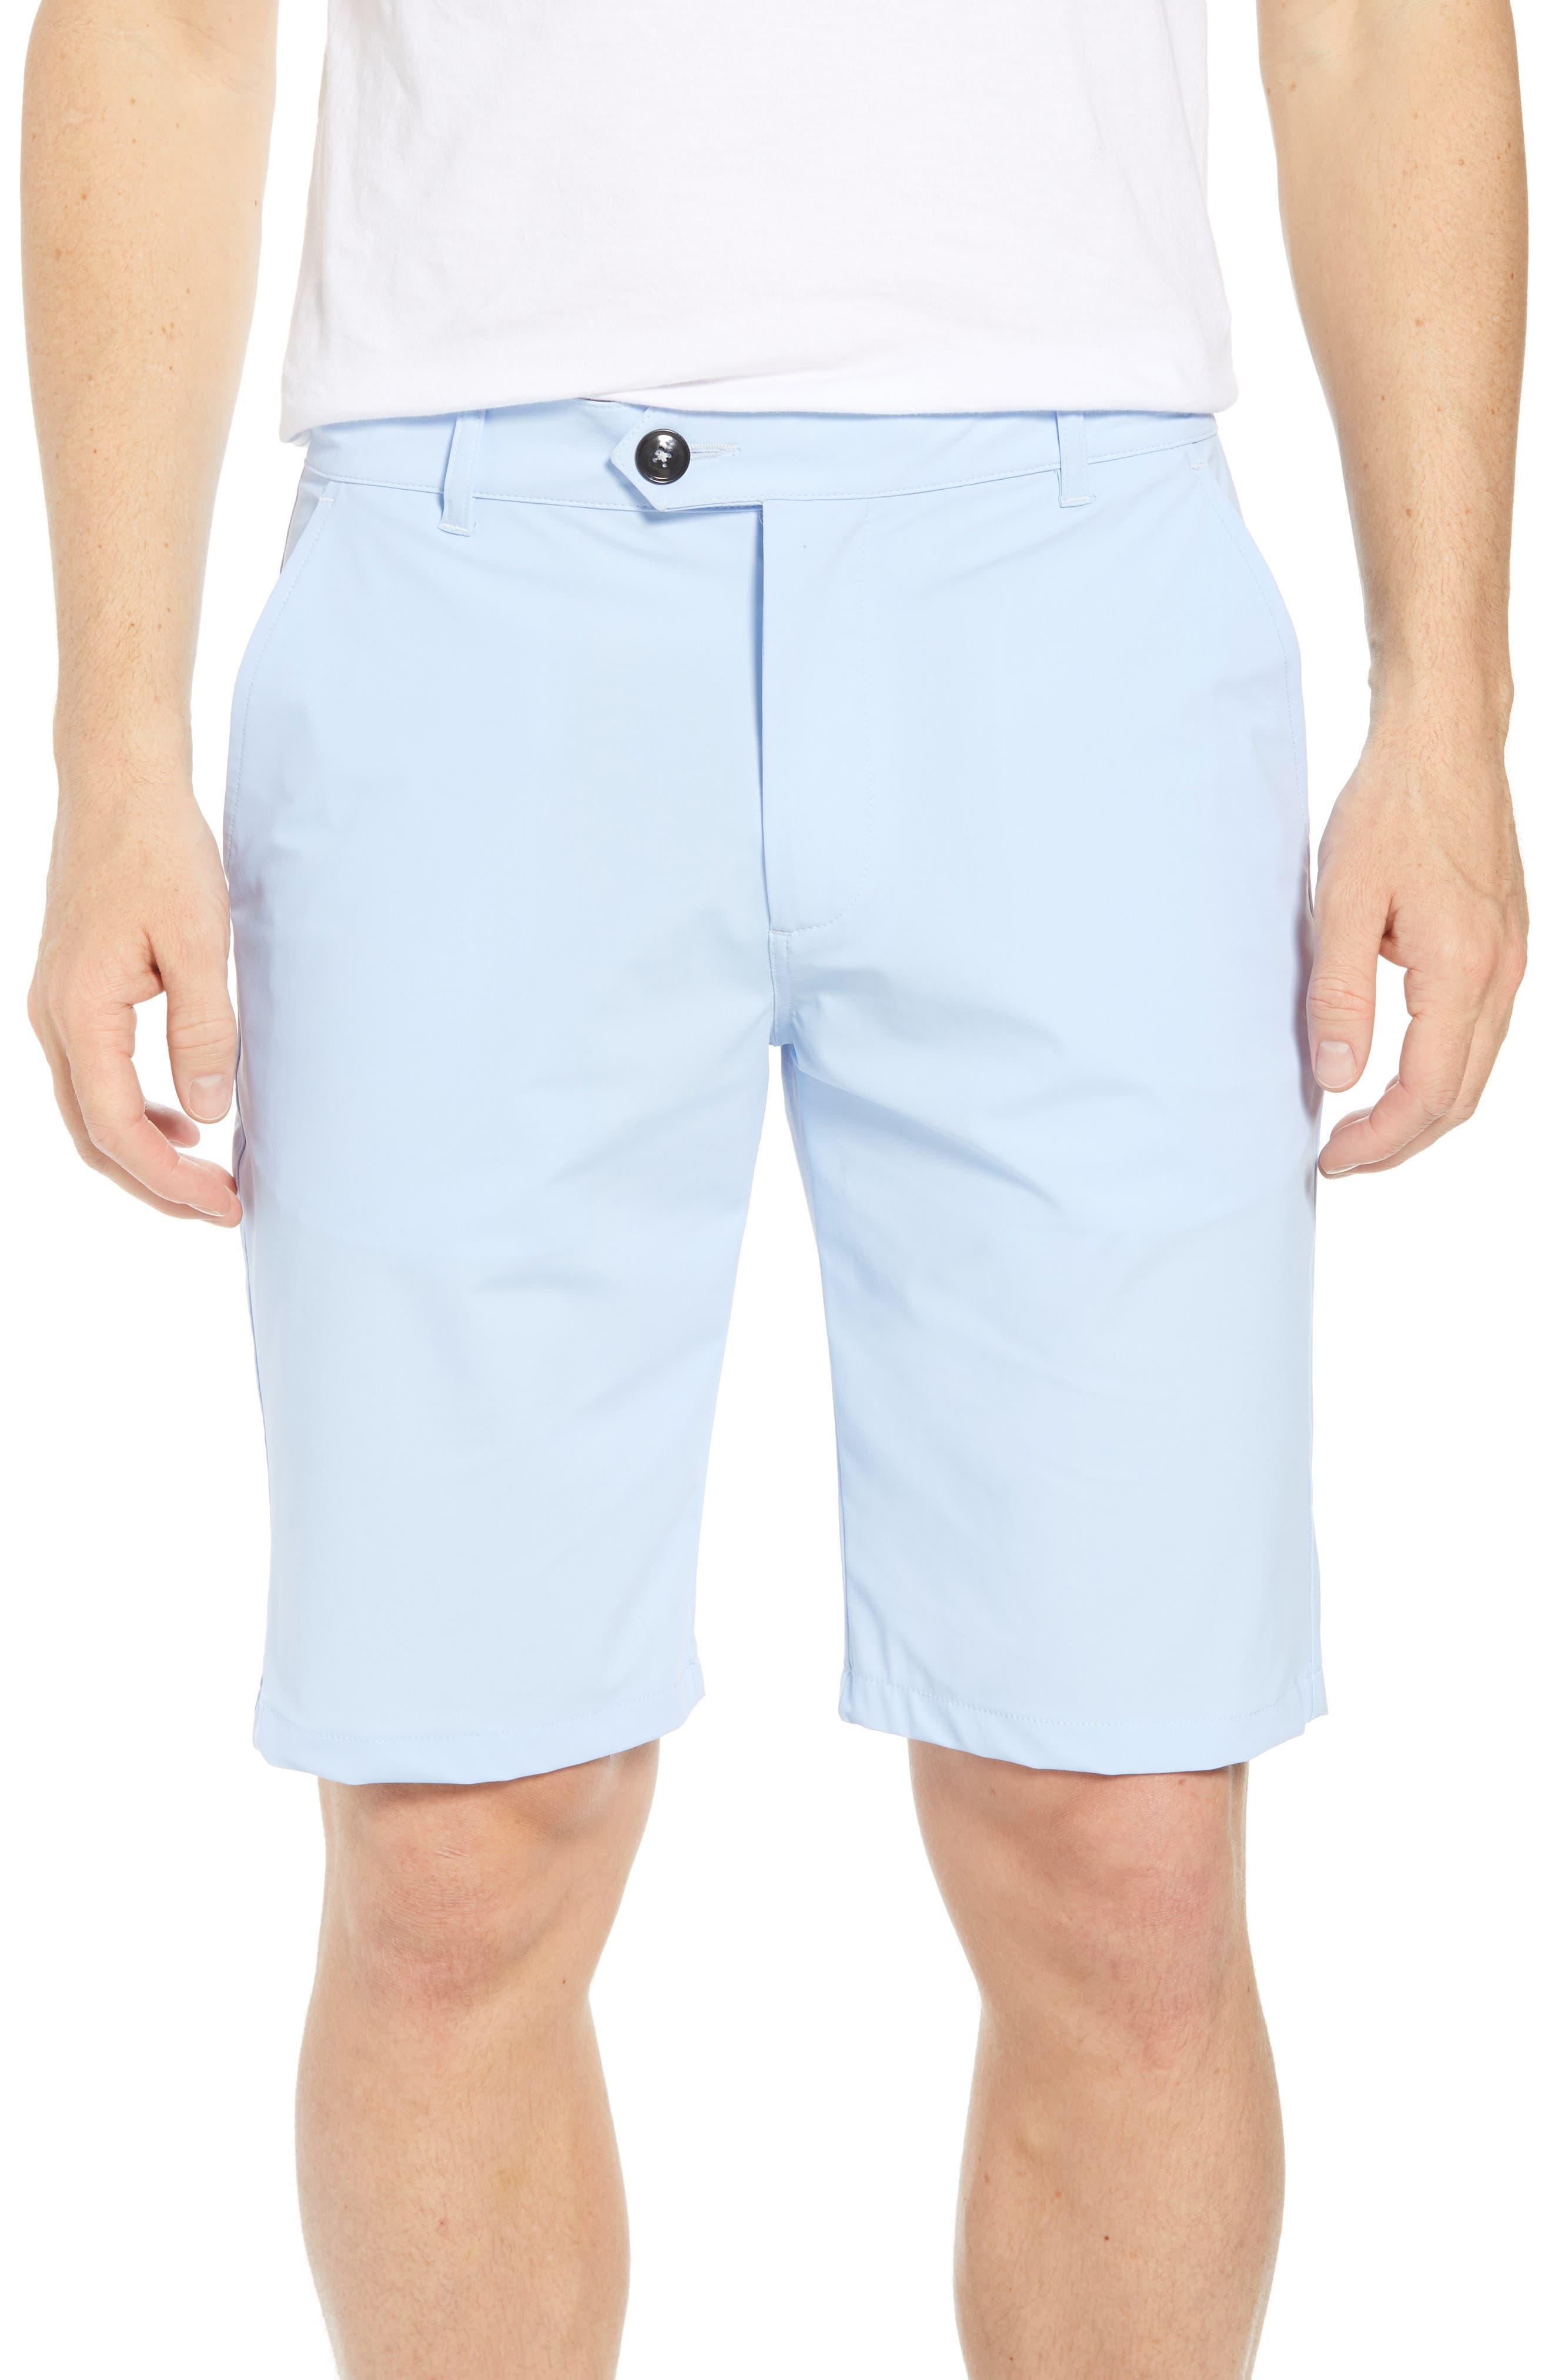 Montauk Shorts,                         Main,                         color, WOLF